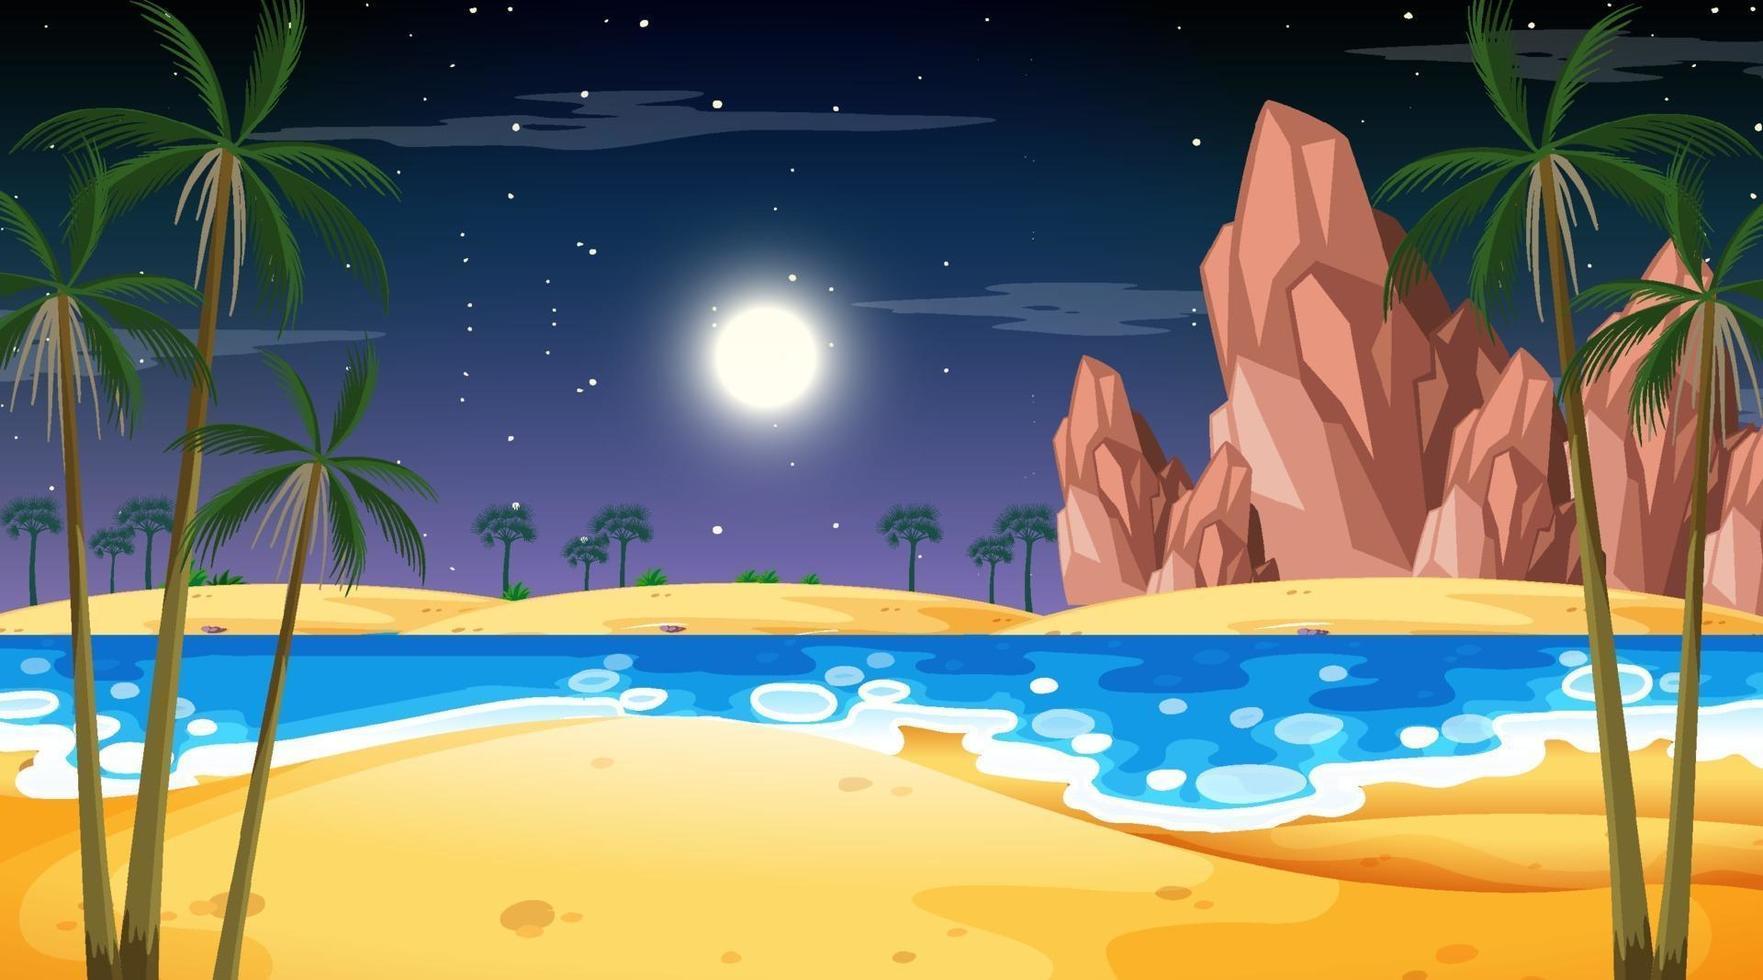 tropiskt strandlandskap på nattscenen vektor